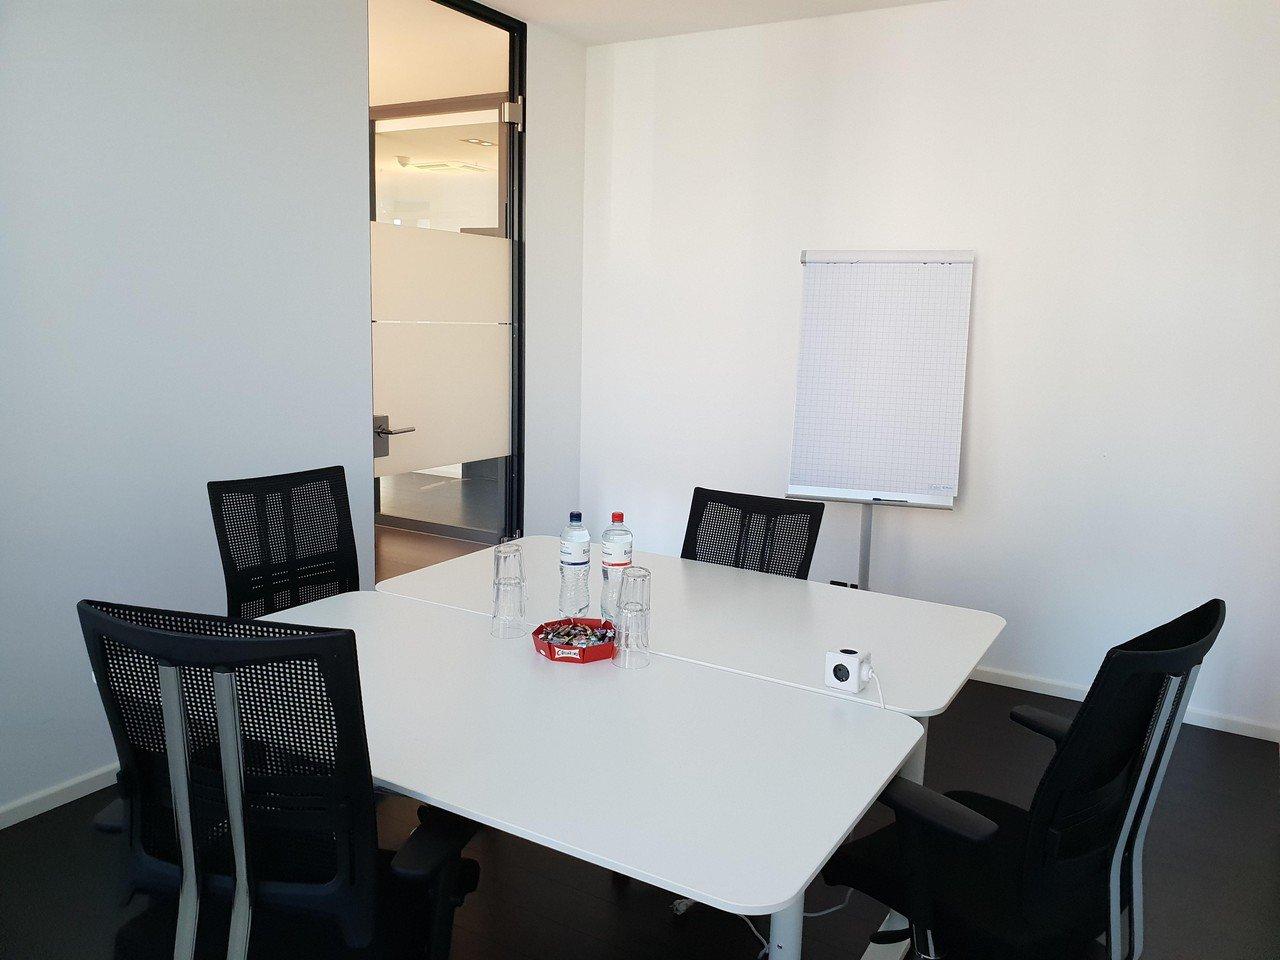 Hamburg  Meeting room TripUp GmbH - Small Meetingroom image 0